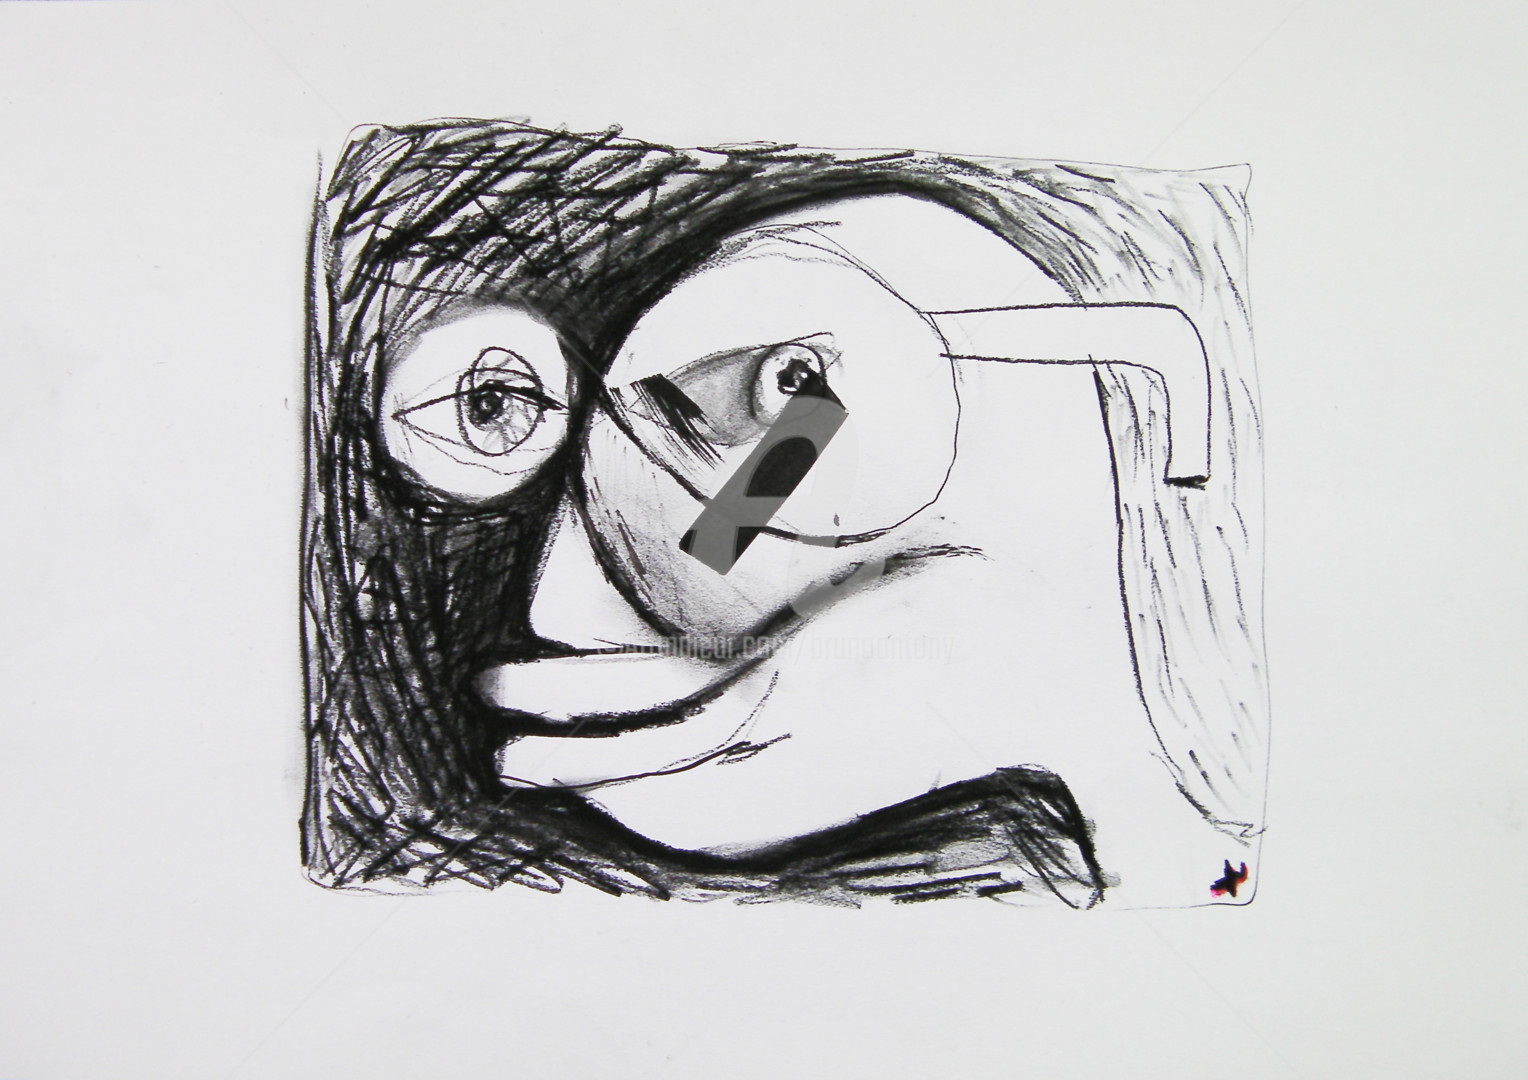 Bruno Antony-Thouret (bruno antony) - Refiguration express